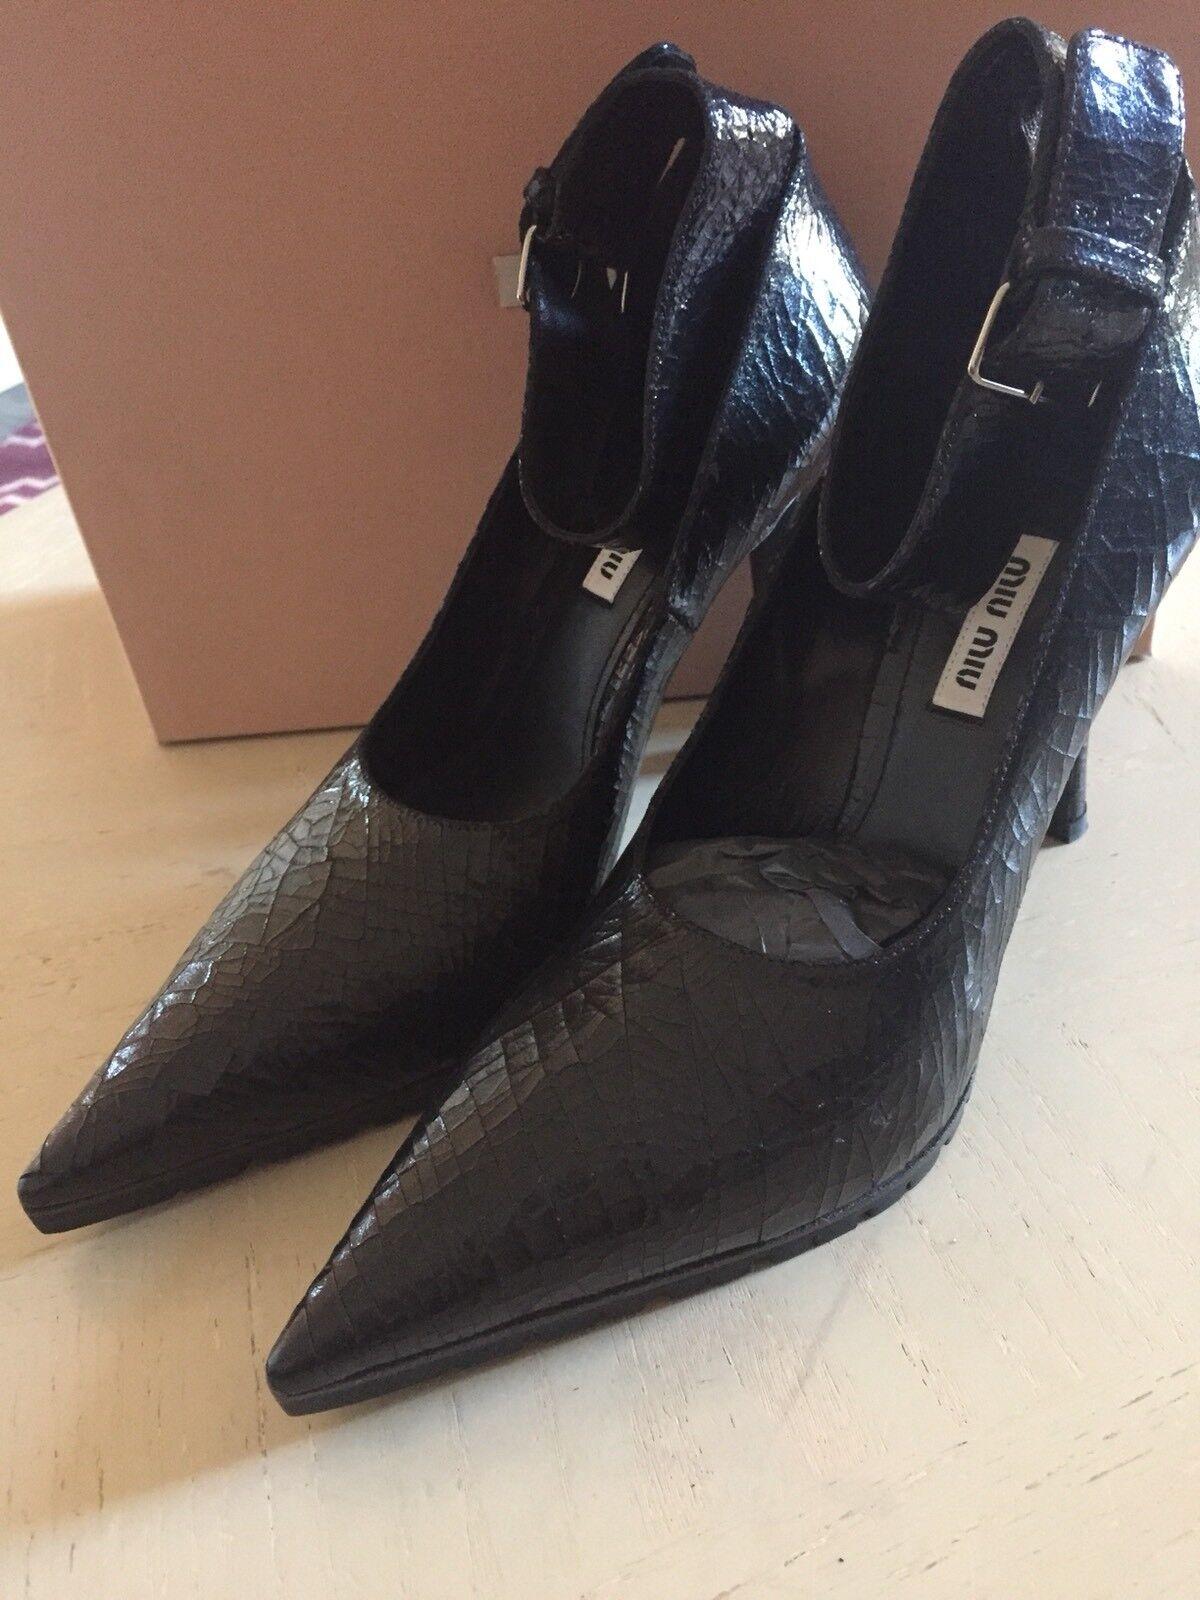 NIB Miu Miu Women's Prada Women's Miu Calzature Cracle Classic Pumps Black 39 Italy $730 ee68f6